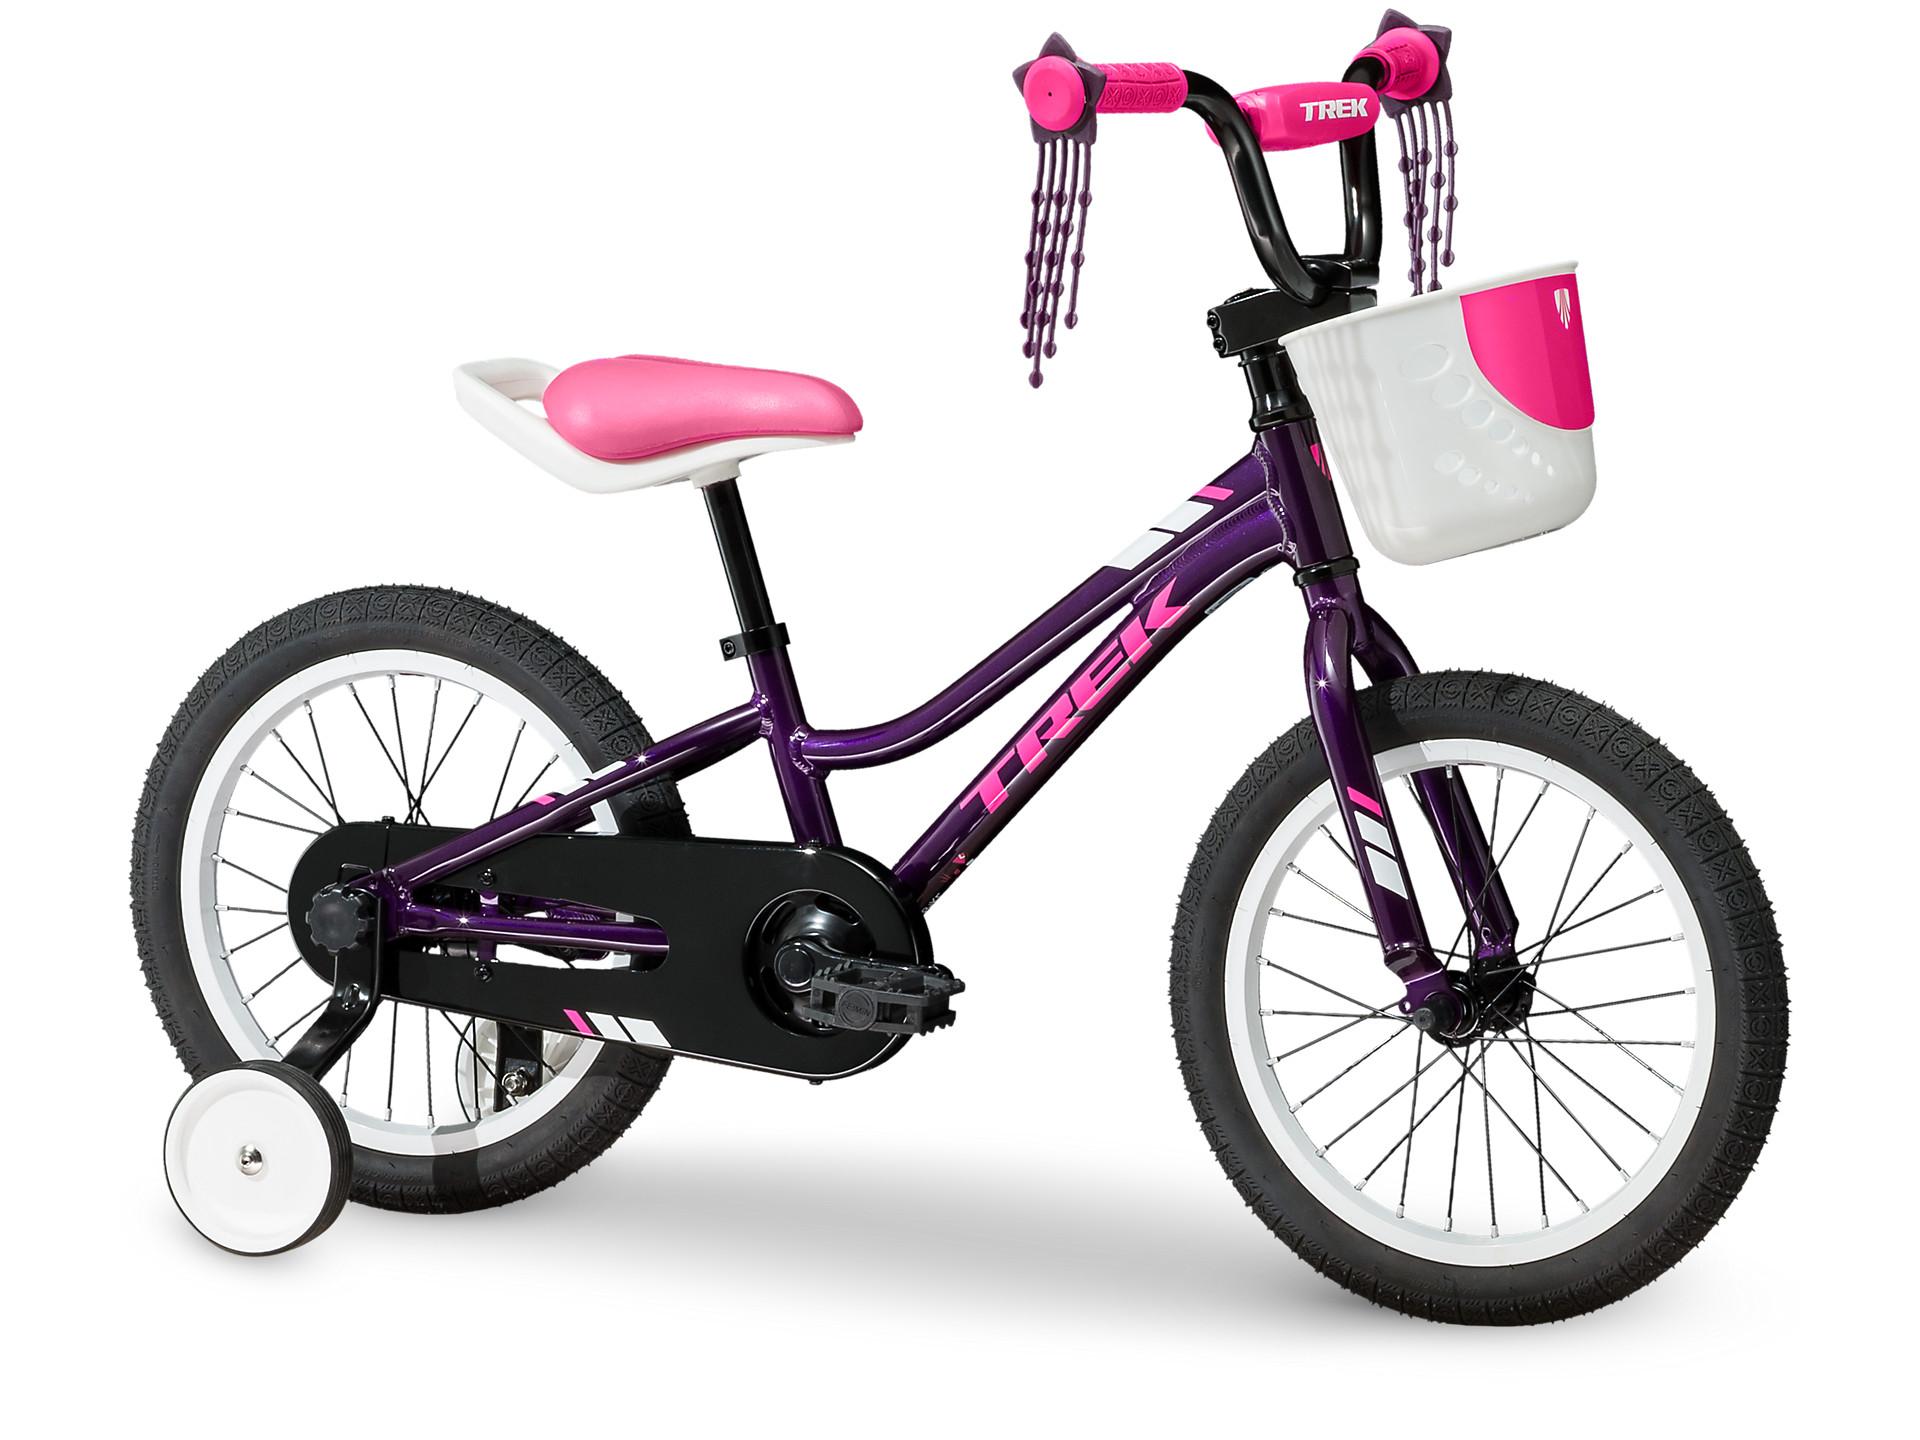 4d76a1befda Precaliber 16 Girls' | Trek Bikes (AU)